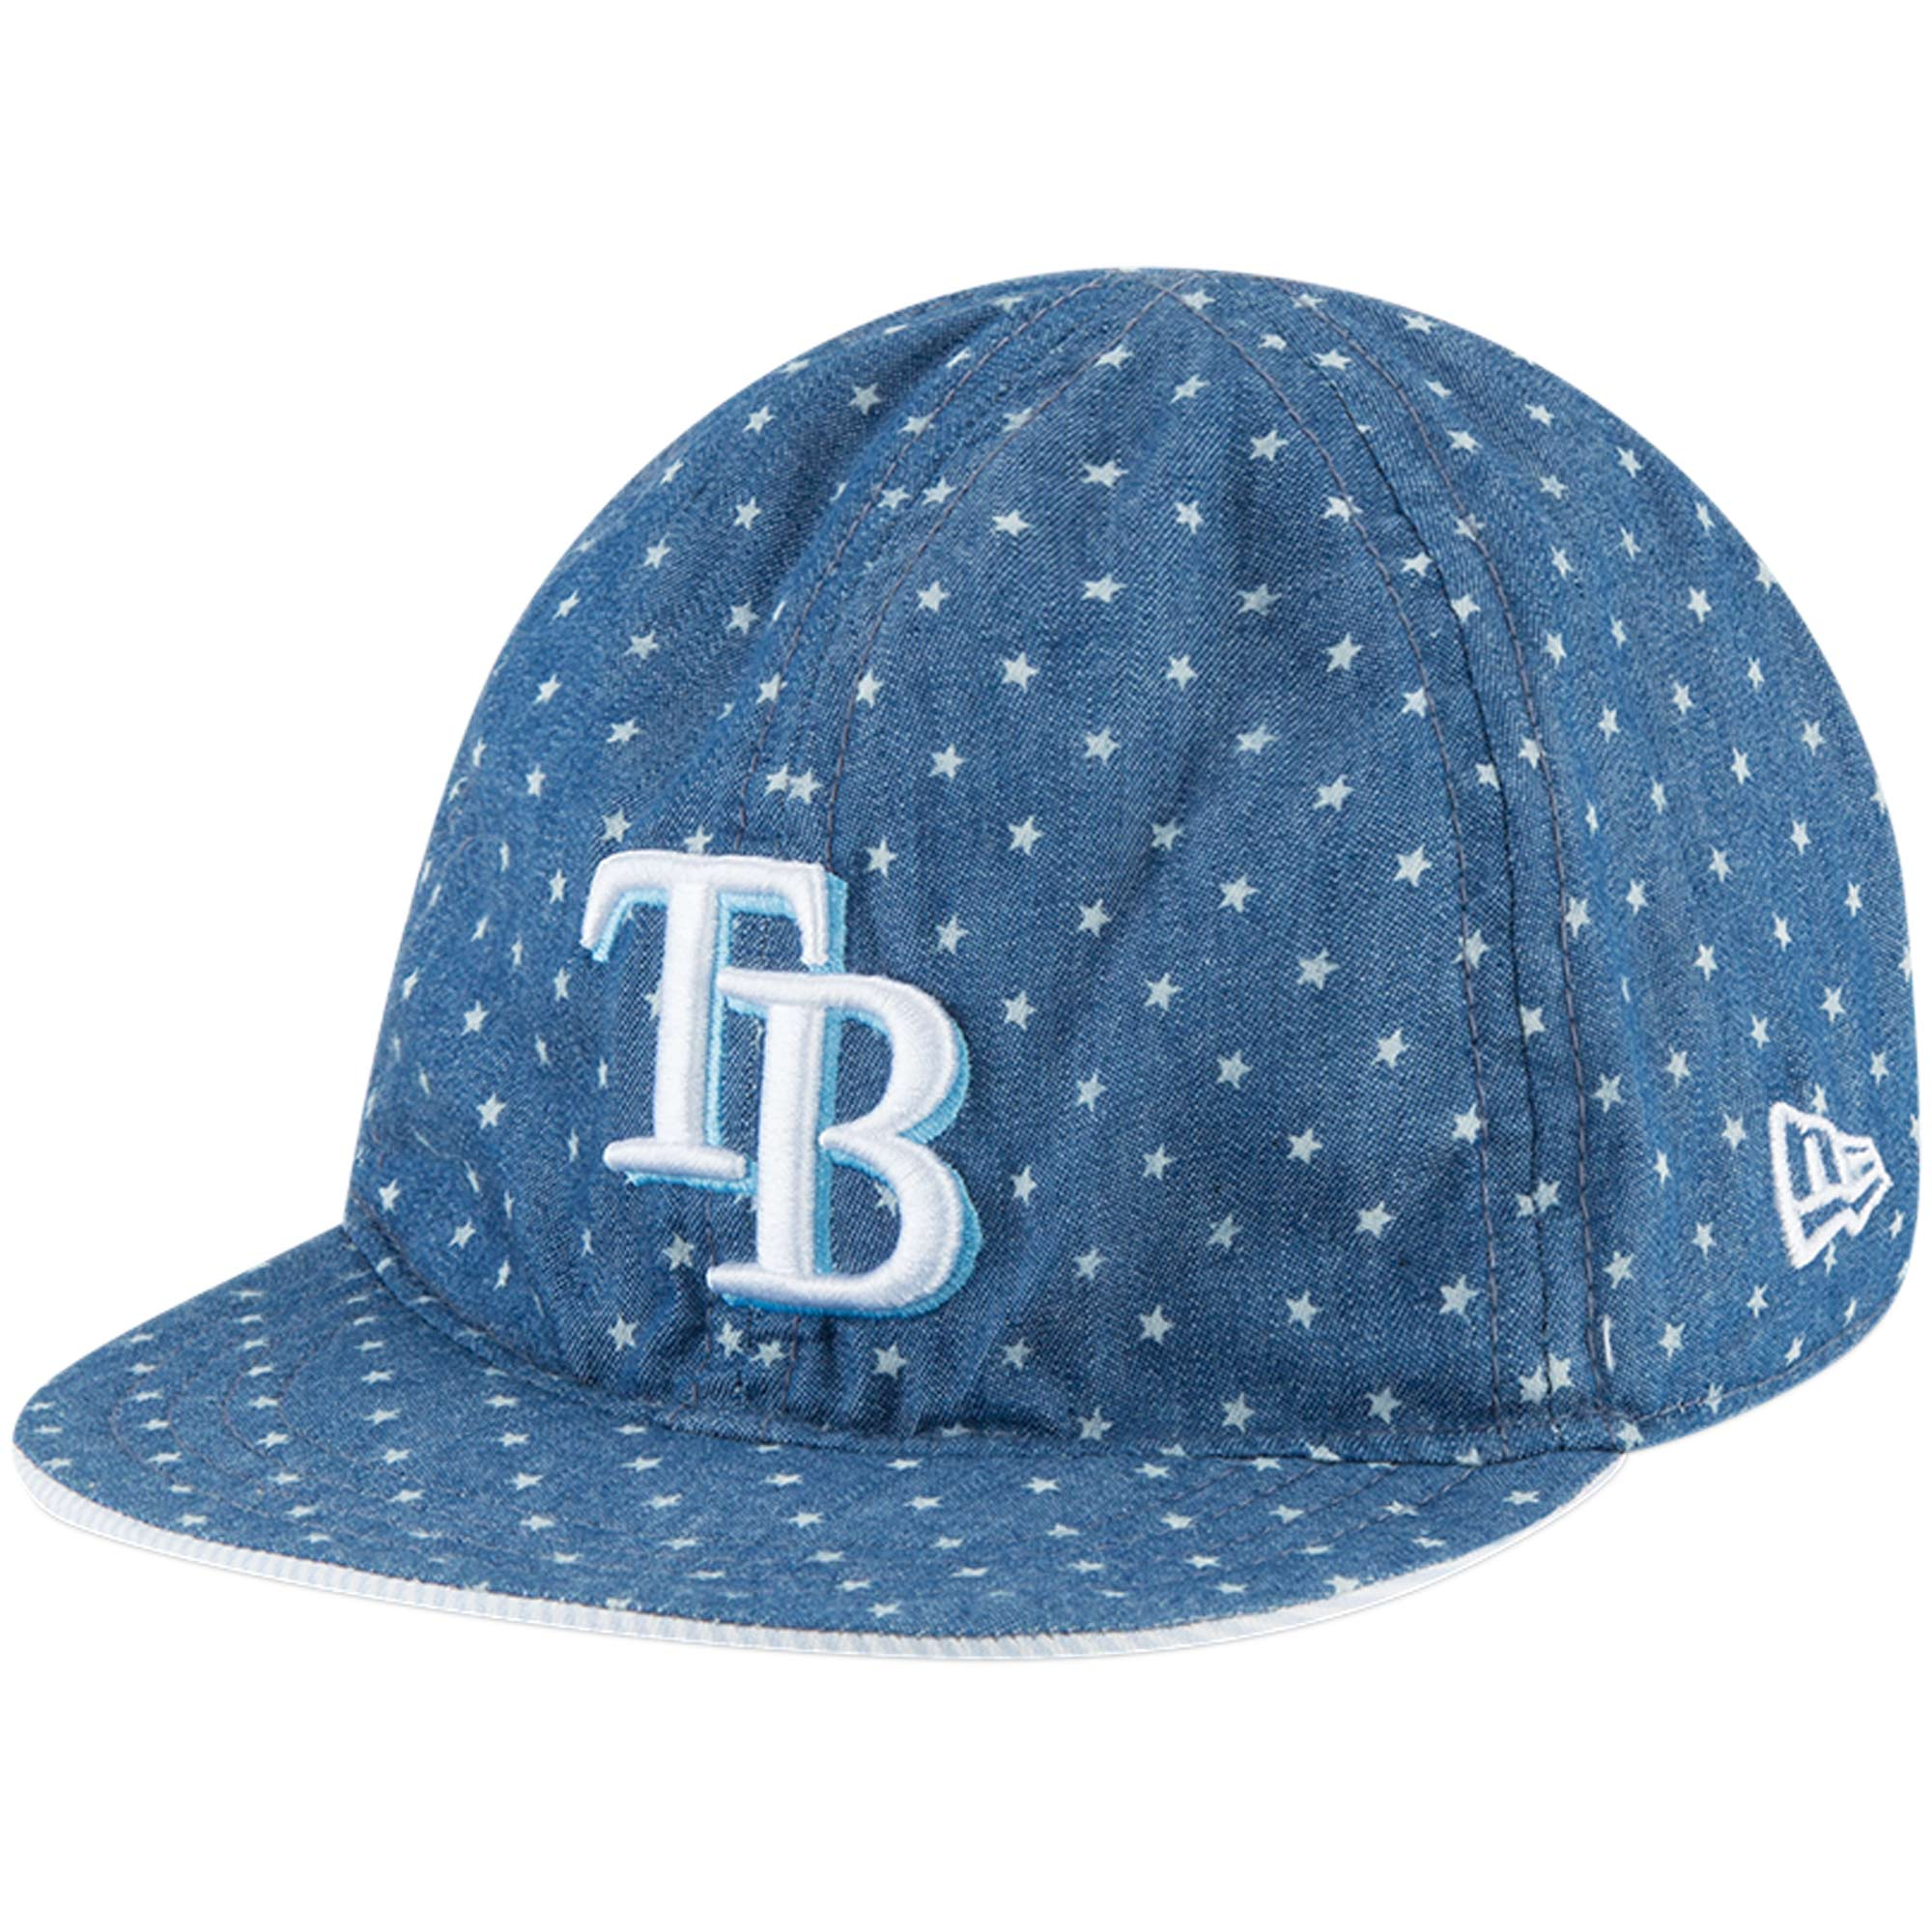 Tampa Bay Rays New Era Infant Flip 9TWENTY Adjustable Hat - Denim/White - OSFA